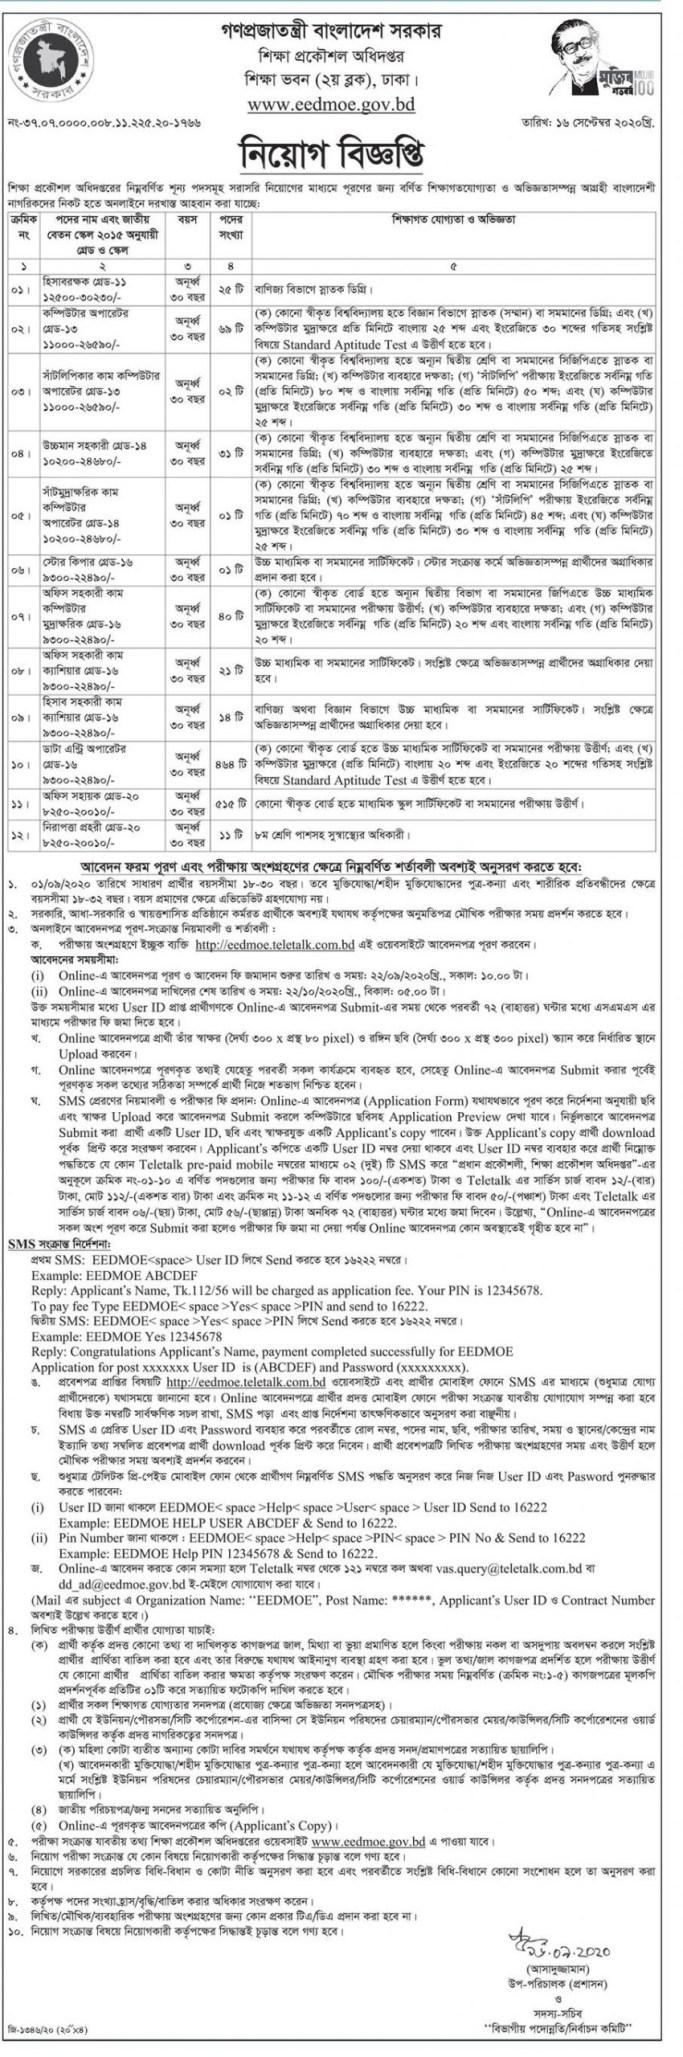 www.eedmoe.teletalk.com.bd online apply